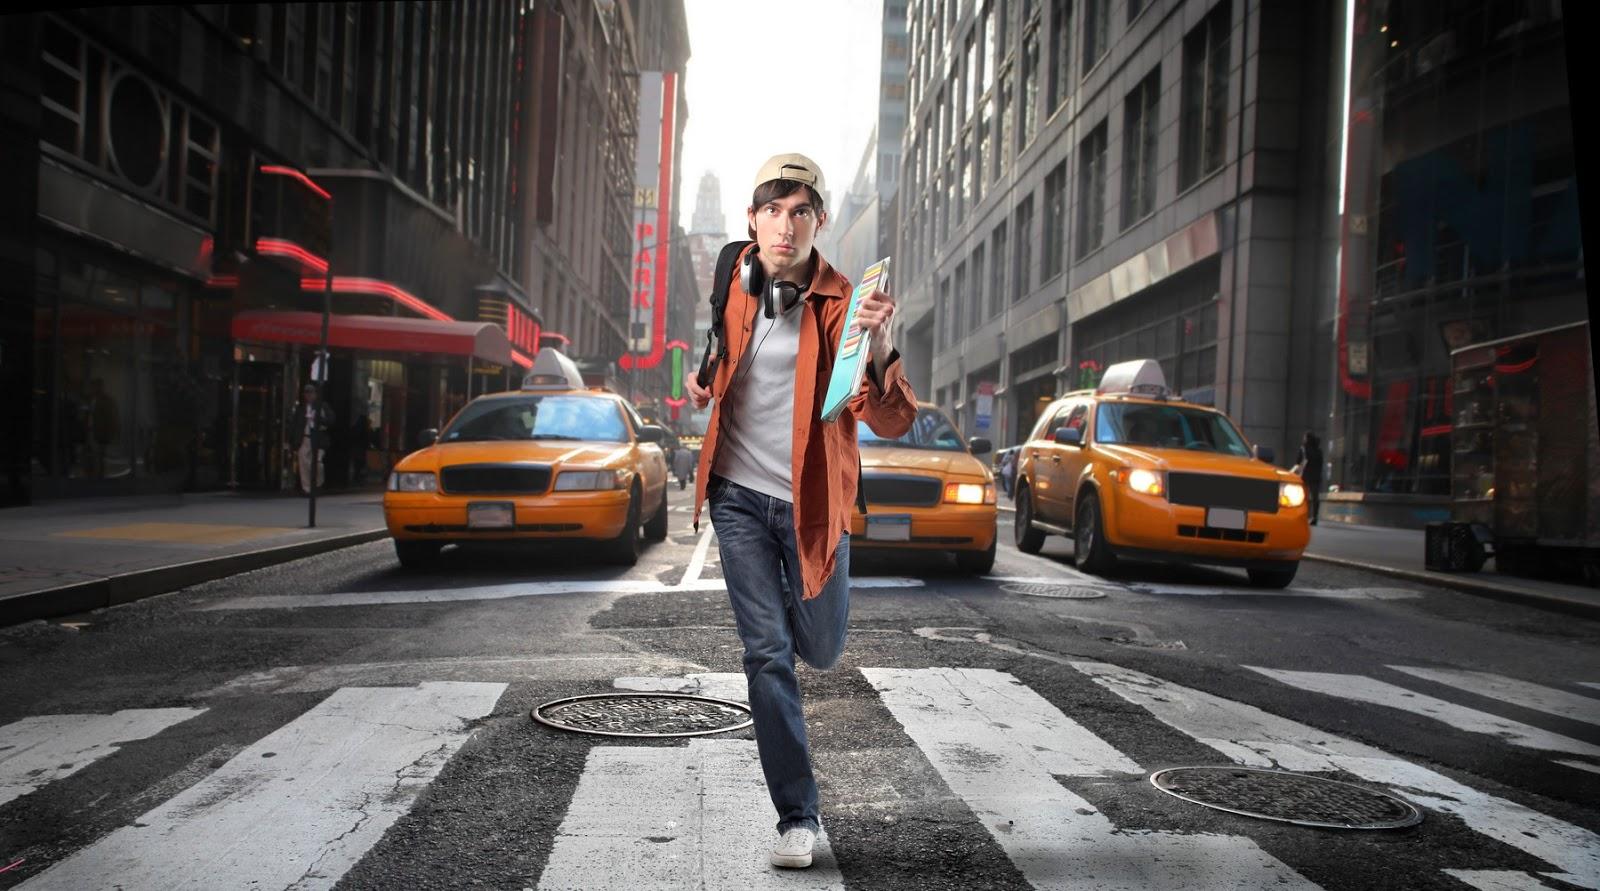 technology_gps-urban-lifestyle_276K[1]